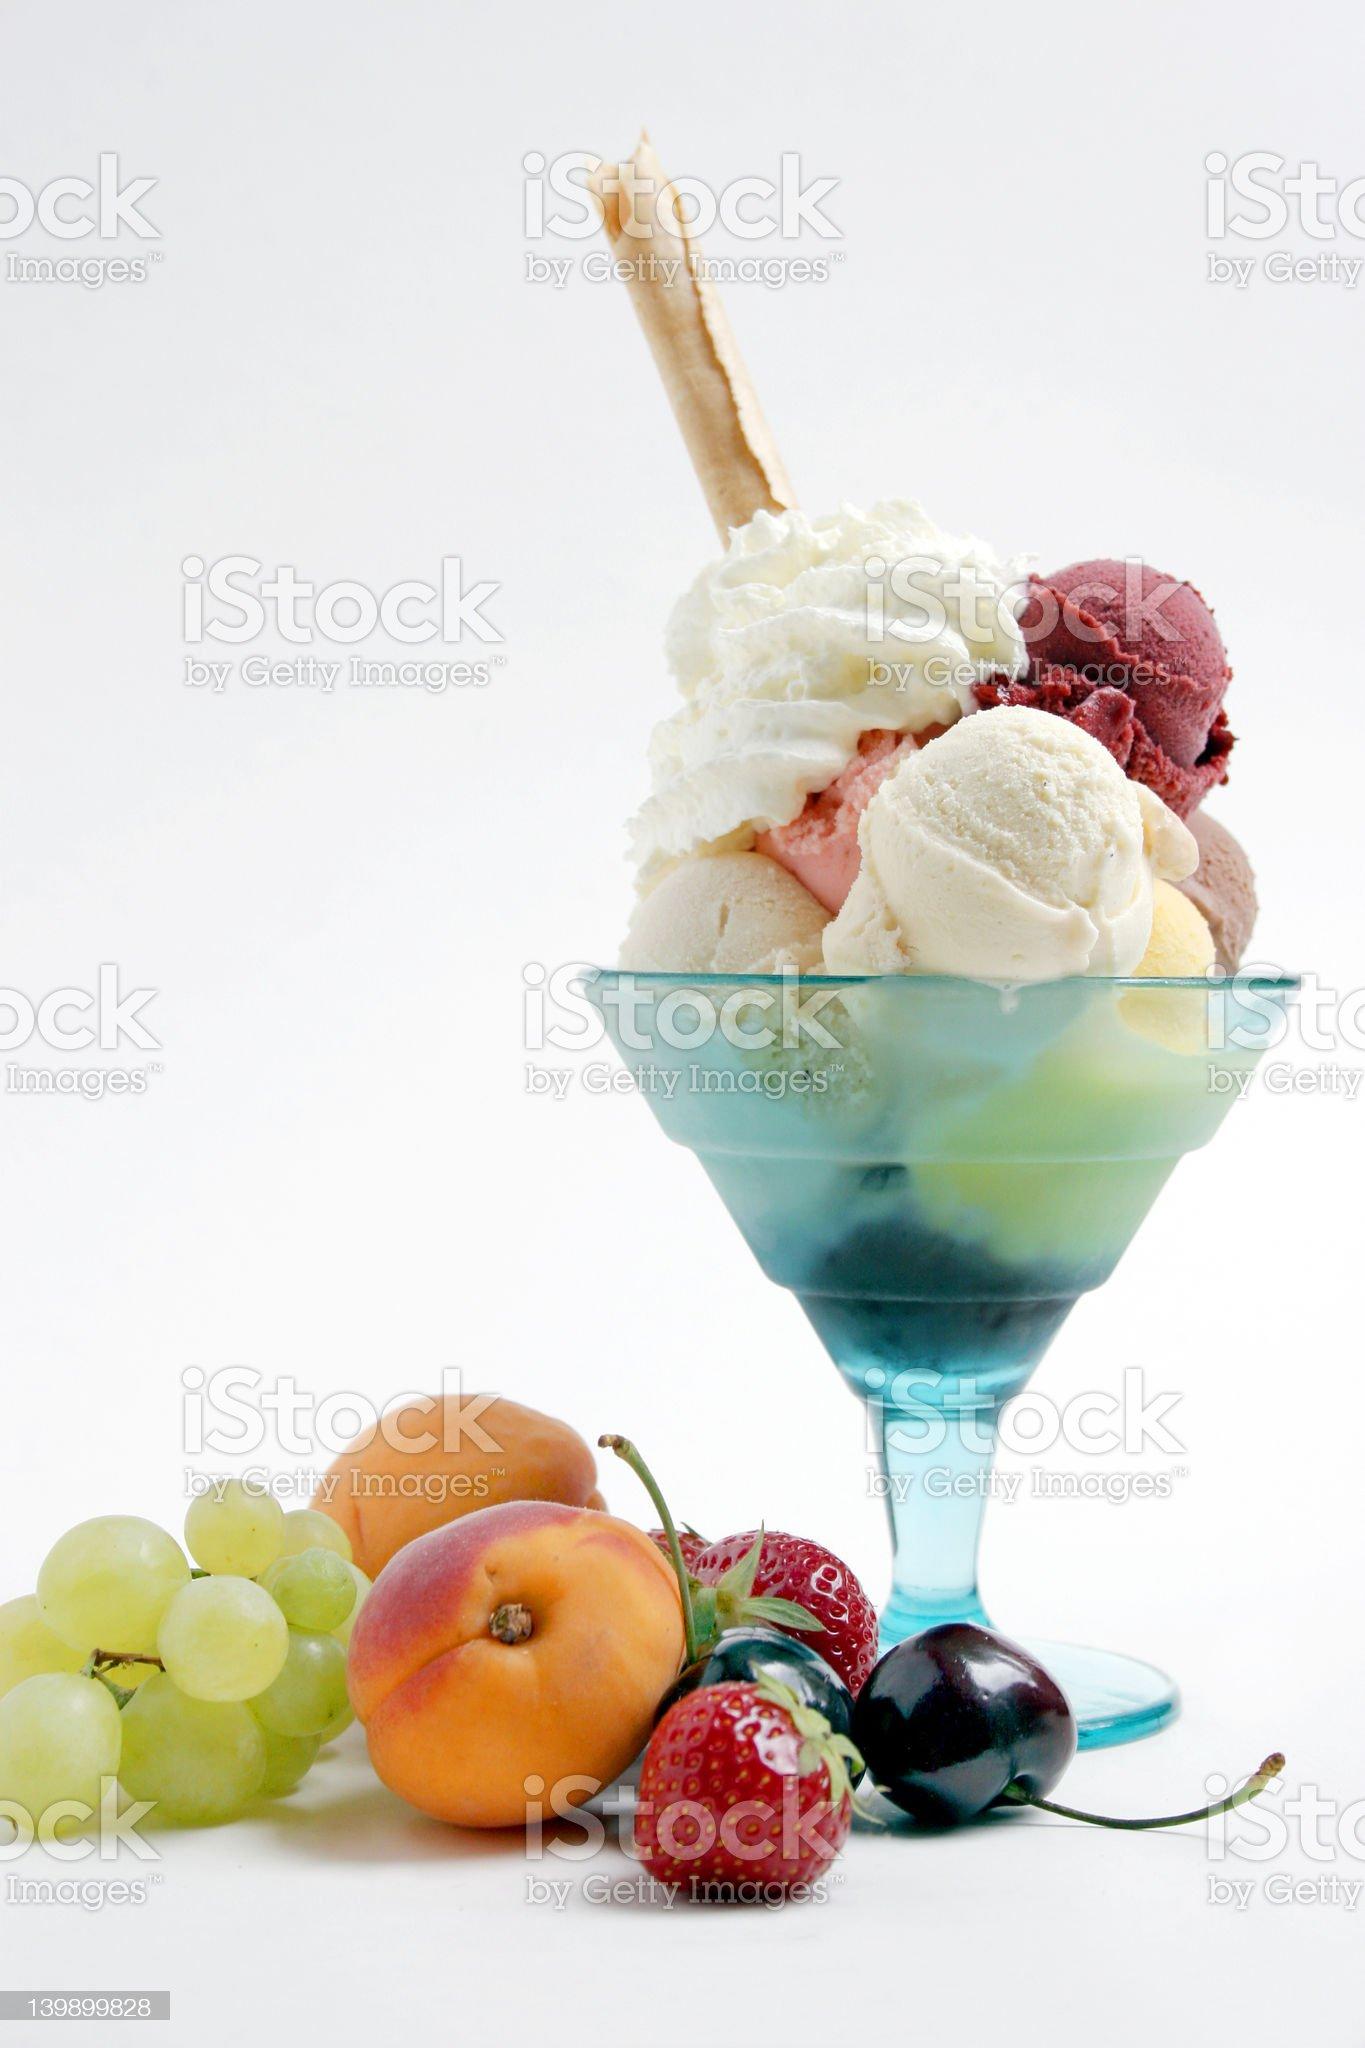 icecream and fruits royalty-free stock photo